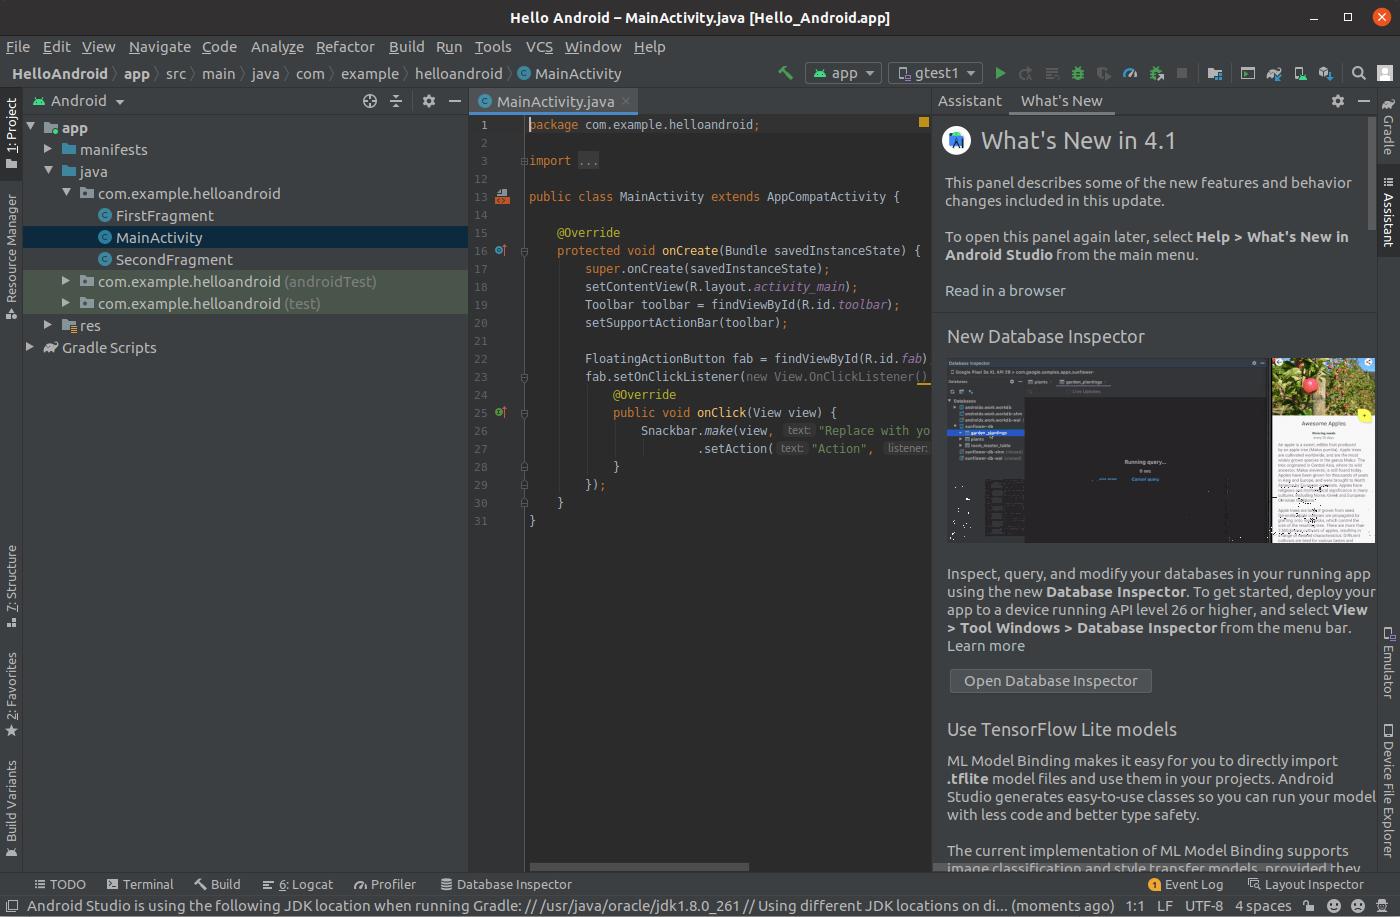 Install Andriod Studio On Ubuntu 20.04 - Default Activity